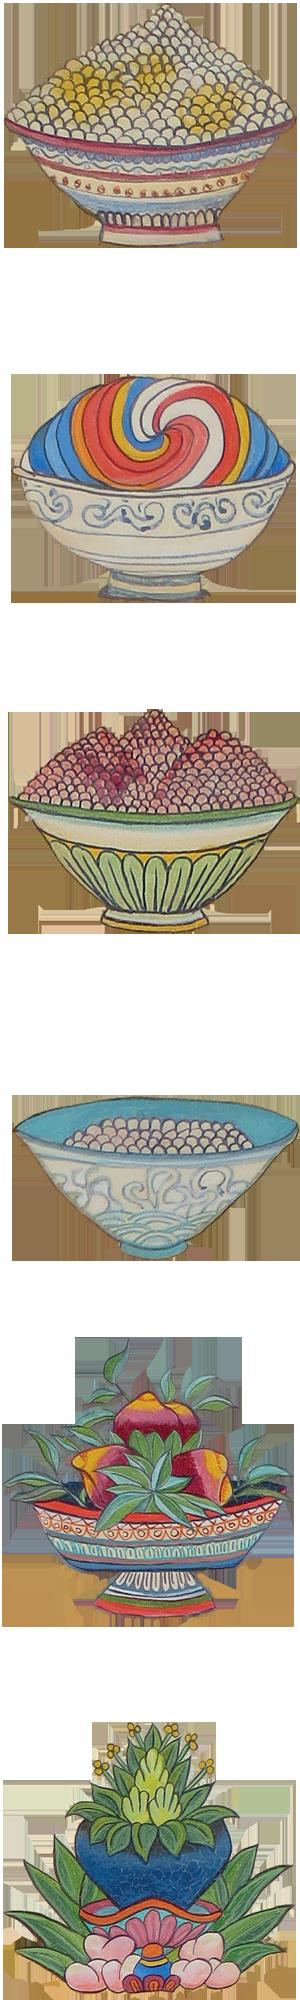 rijtje-planten